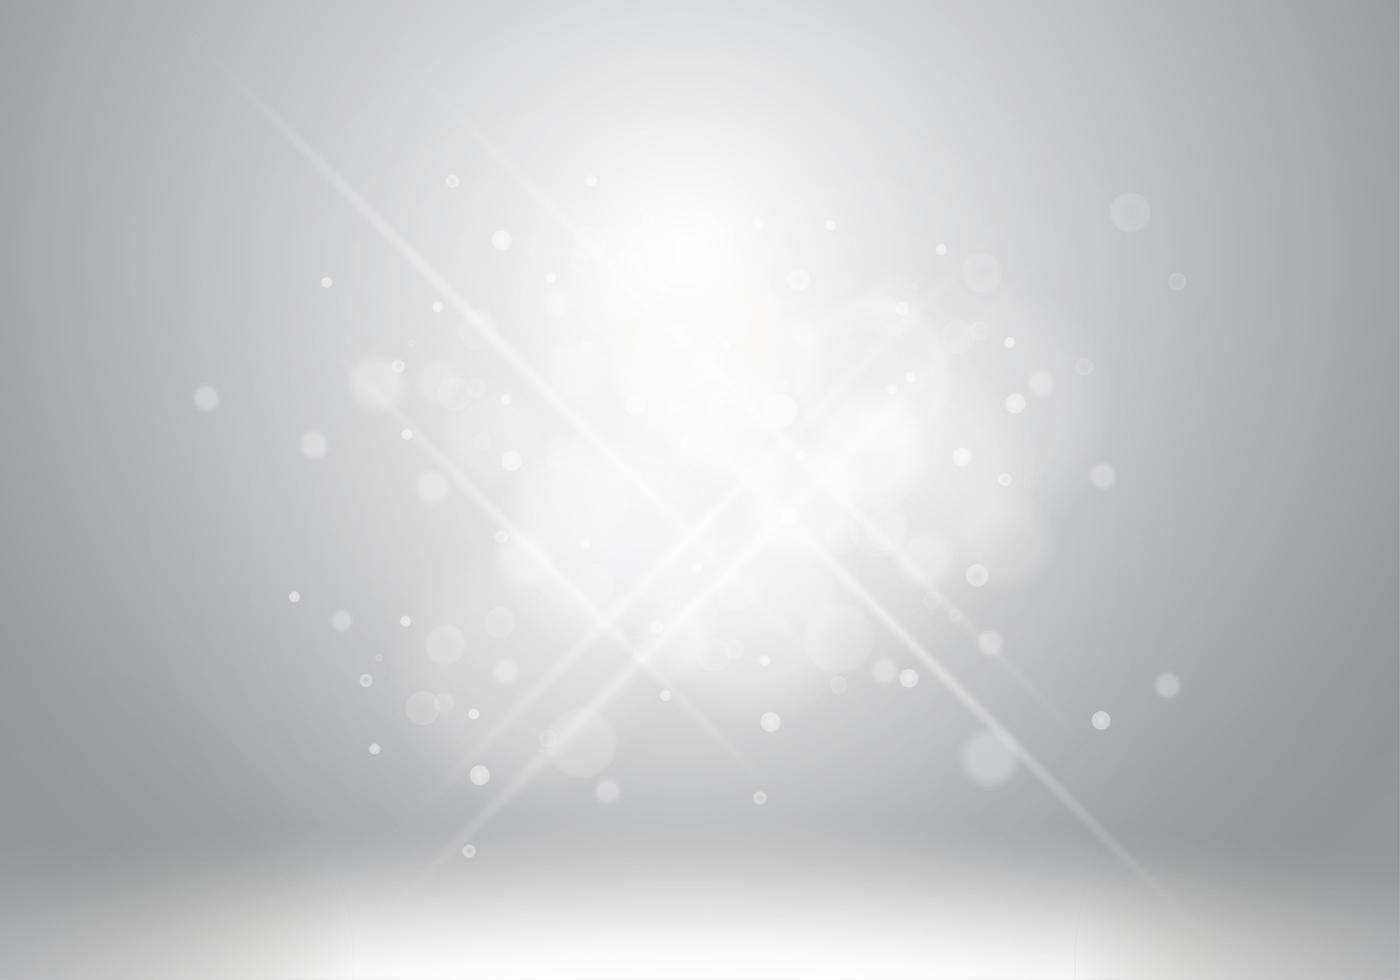 Grey Gradient Background Shiny Free Vector Grey Gradient Background Vector Free Background